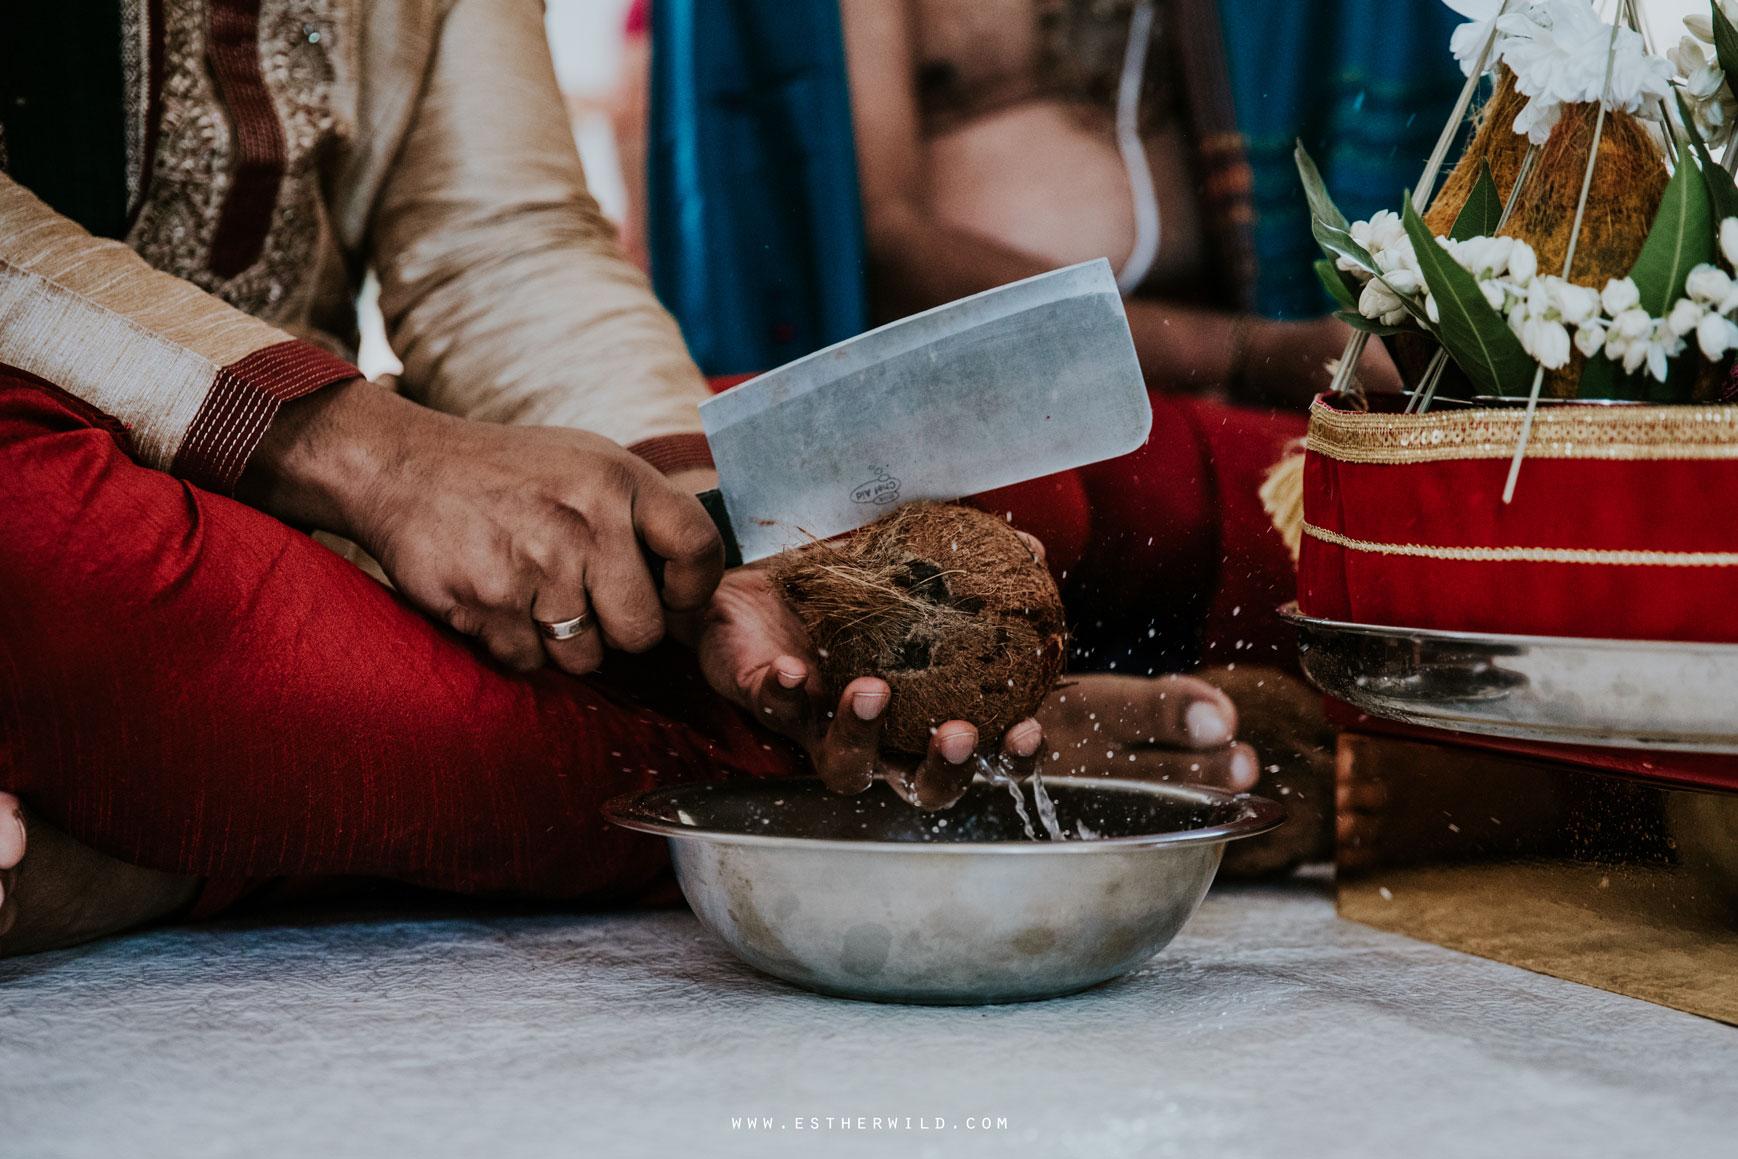 Northbrook_Park_Farnham_Surrey_London_Wedding_Hindu_Fusion_Esther_Wild_Photographer_IMG_3575.jpg